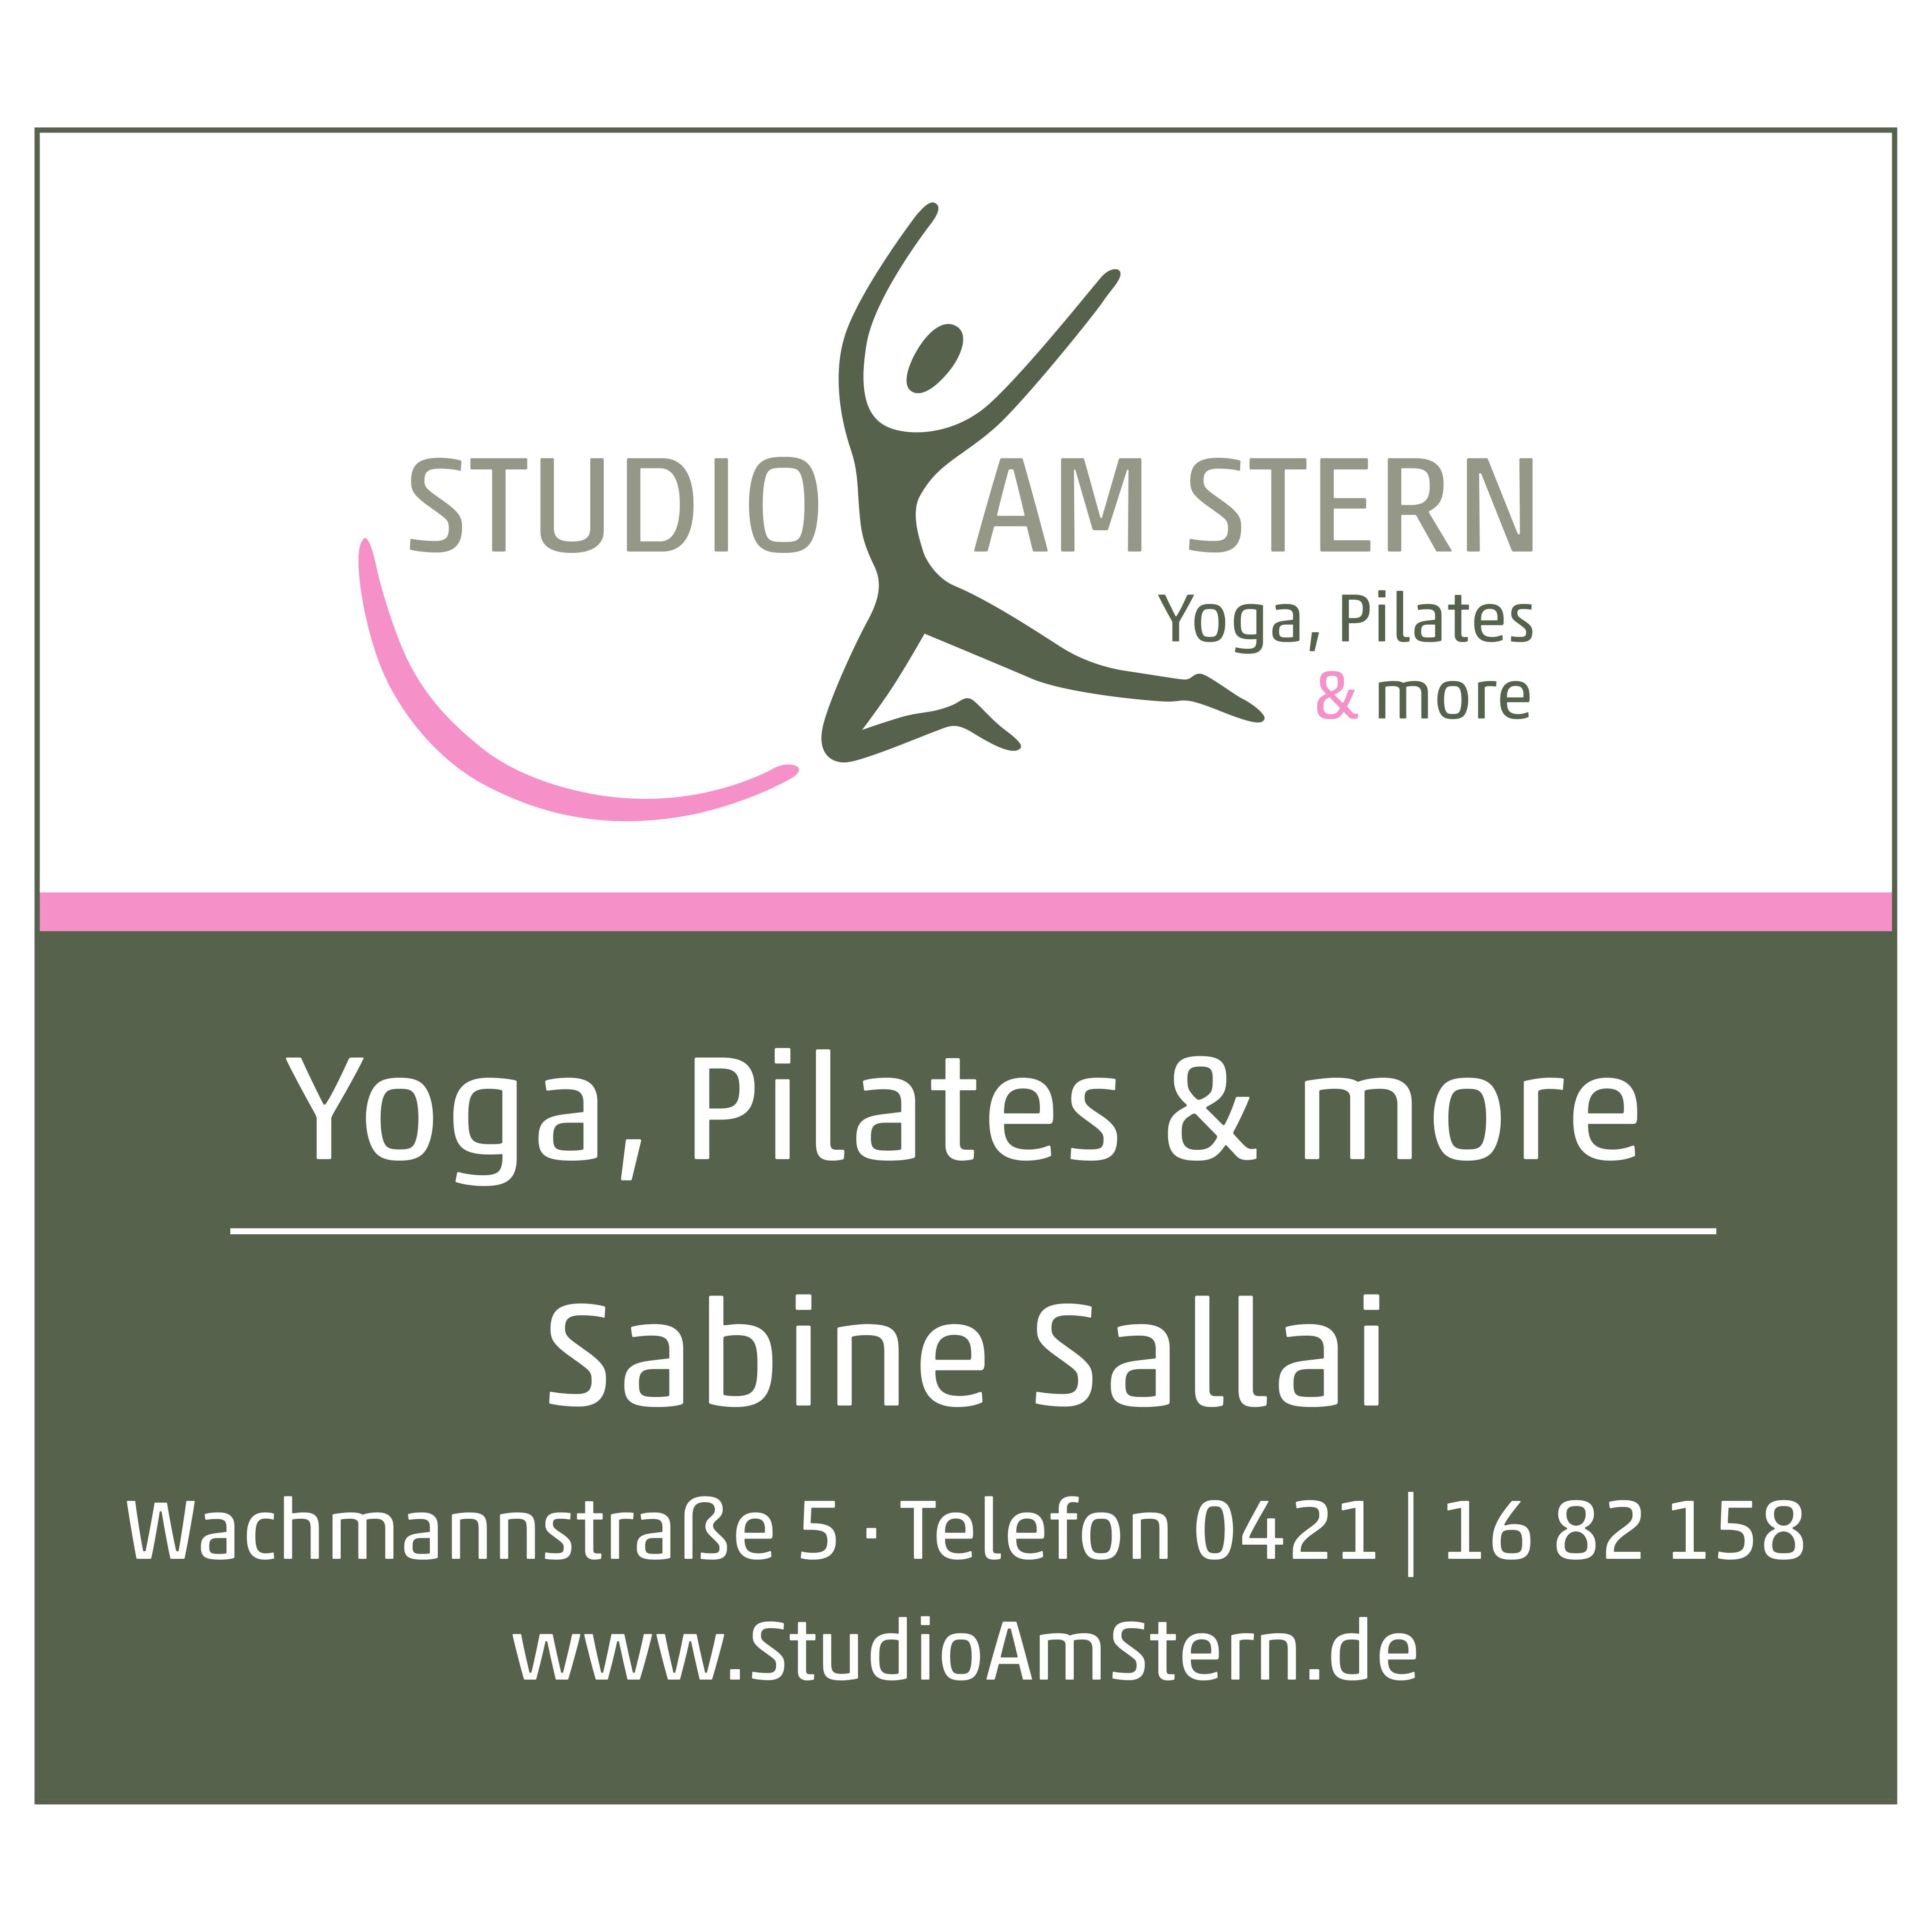 Studio am Stern; Yoga, Pilates and more